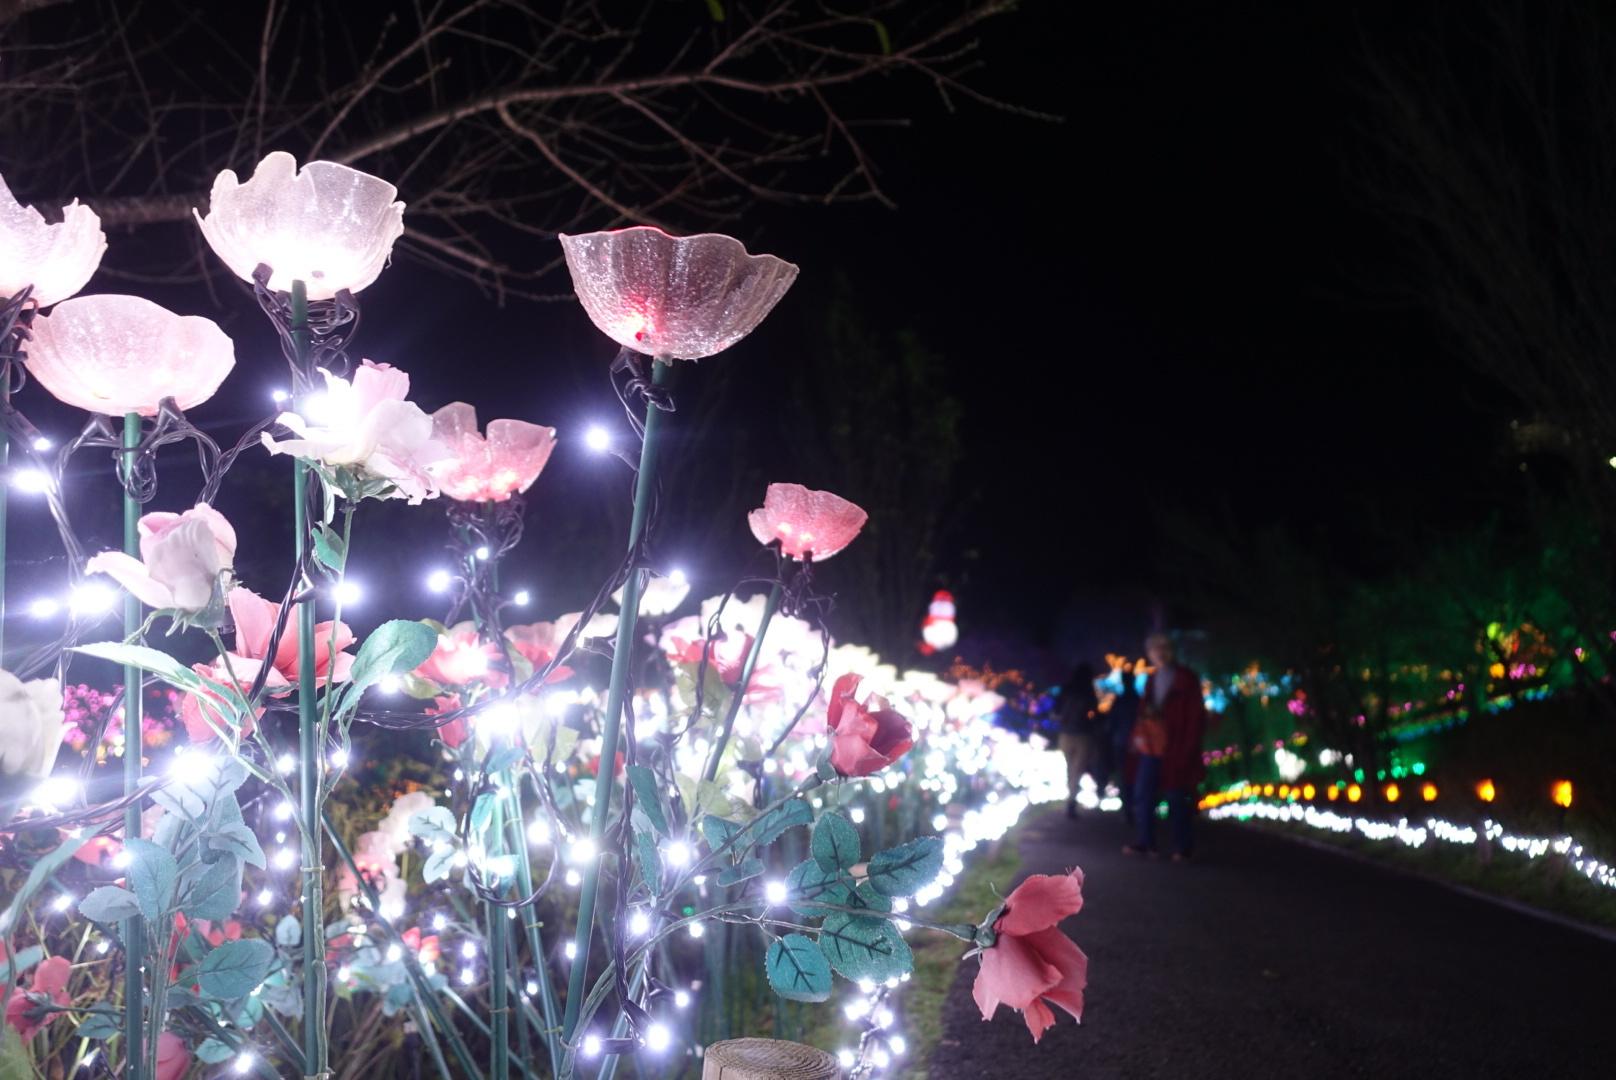 Vol.64♡ 関東最大級!600万級の光の祭典【さがみ湖イルミリオン】_1_4